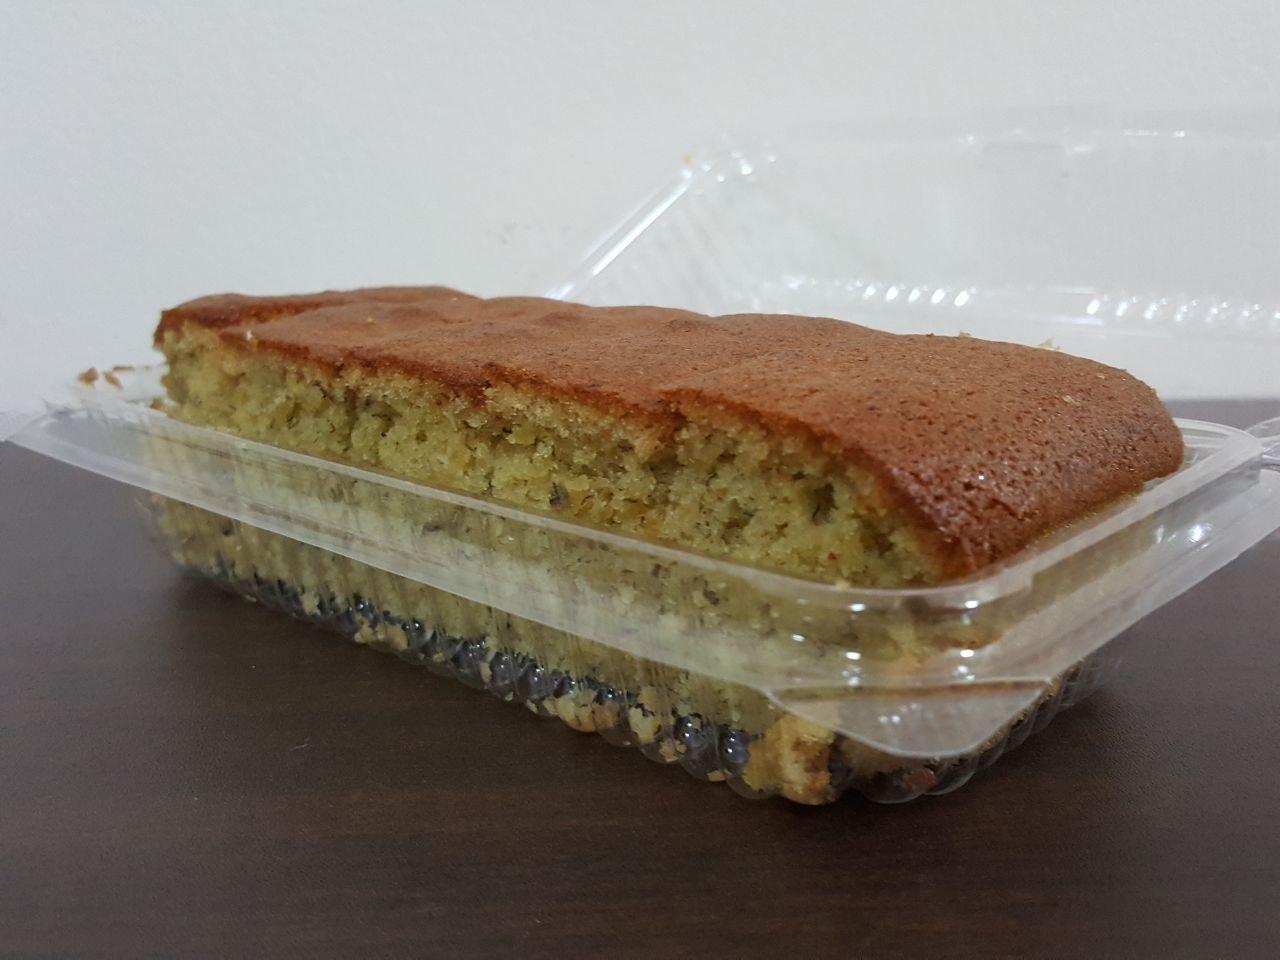 Hiap Joo Bakery & Biscuit Factory 协裕面包西果厂